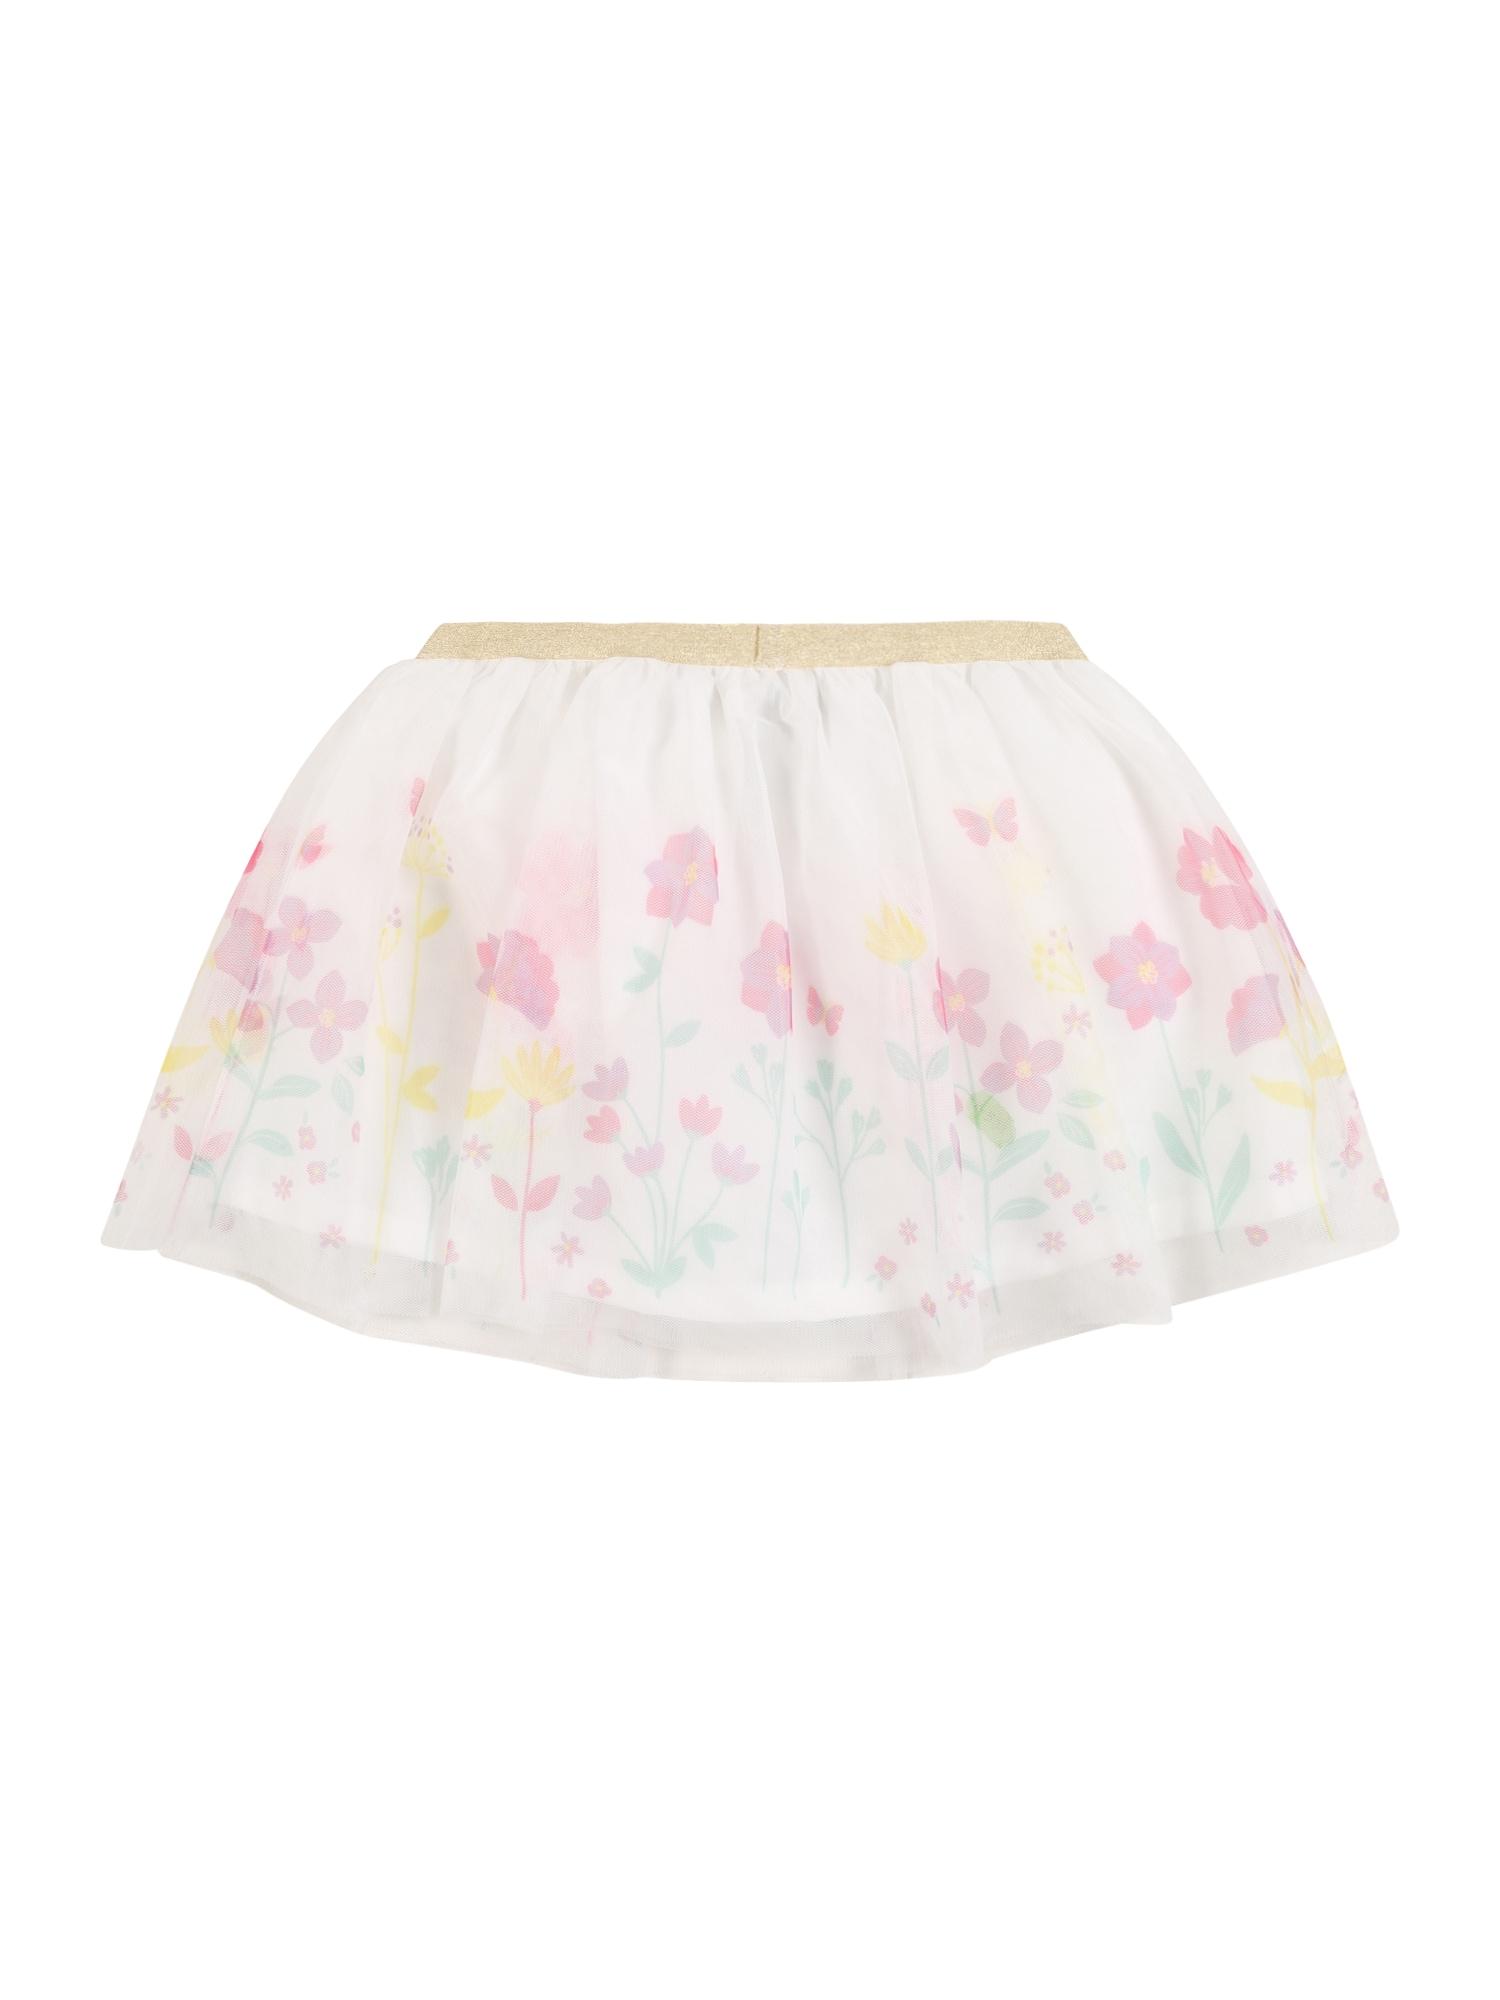 Carter's Sijonas 'Easter Collection S20 white floral tutu' rožių spalva / mišrios spalvos / perlų balta